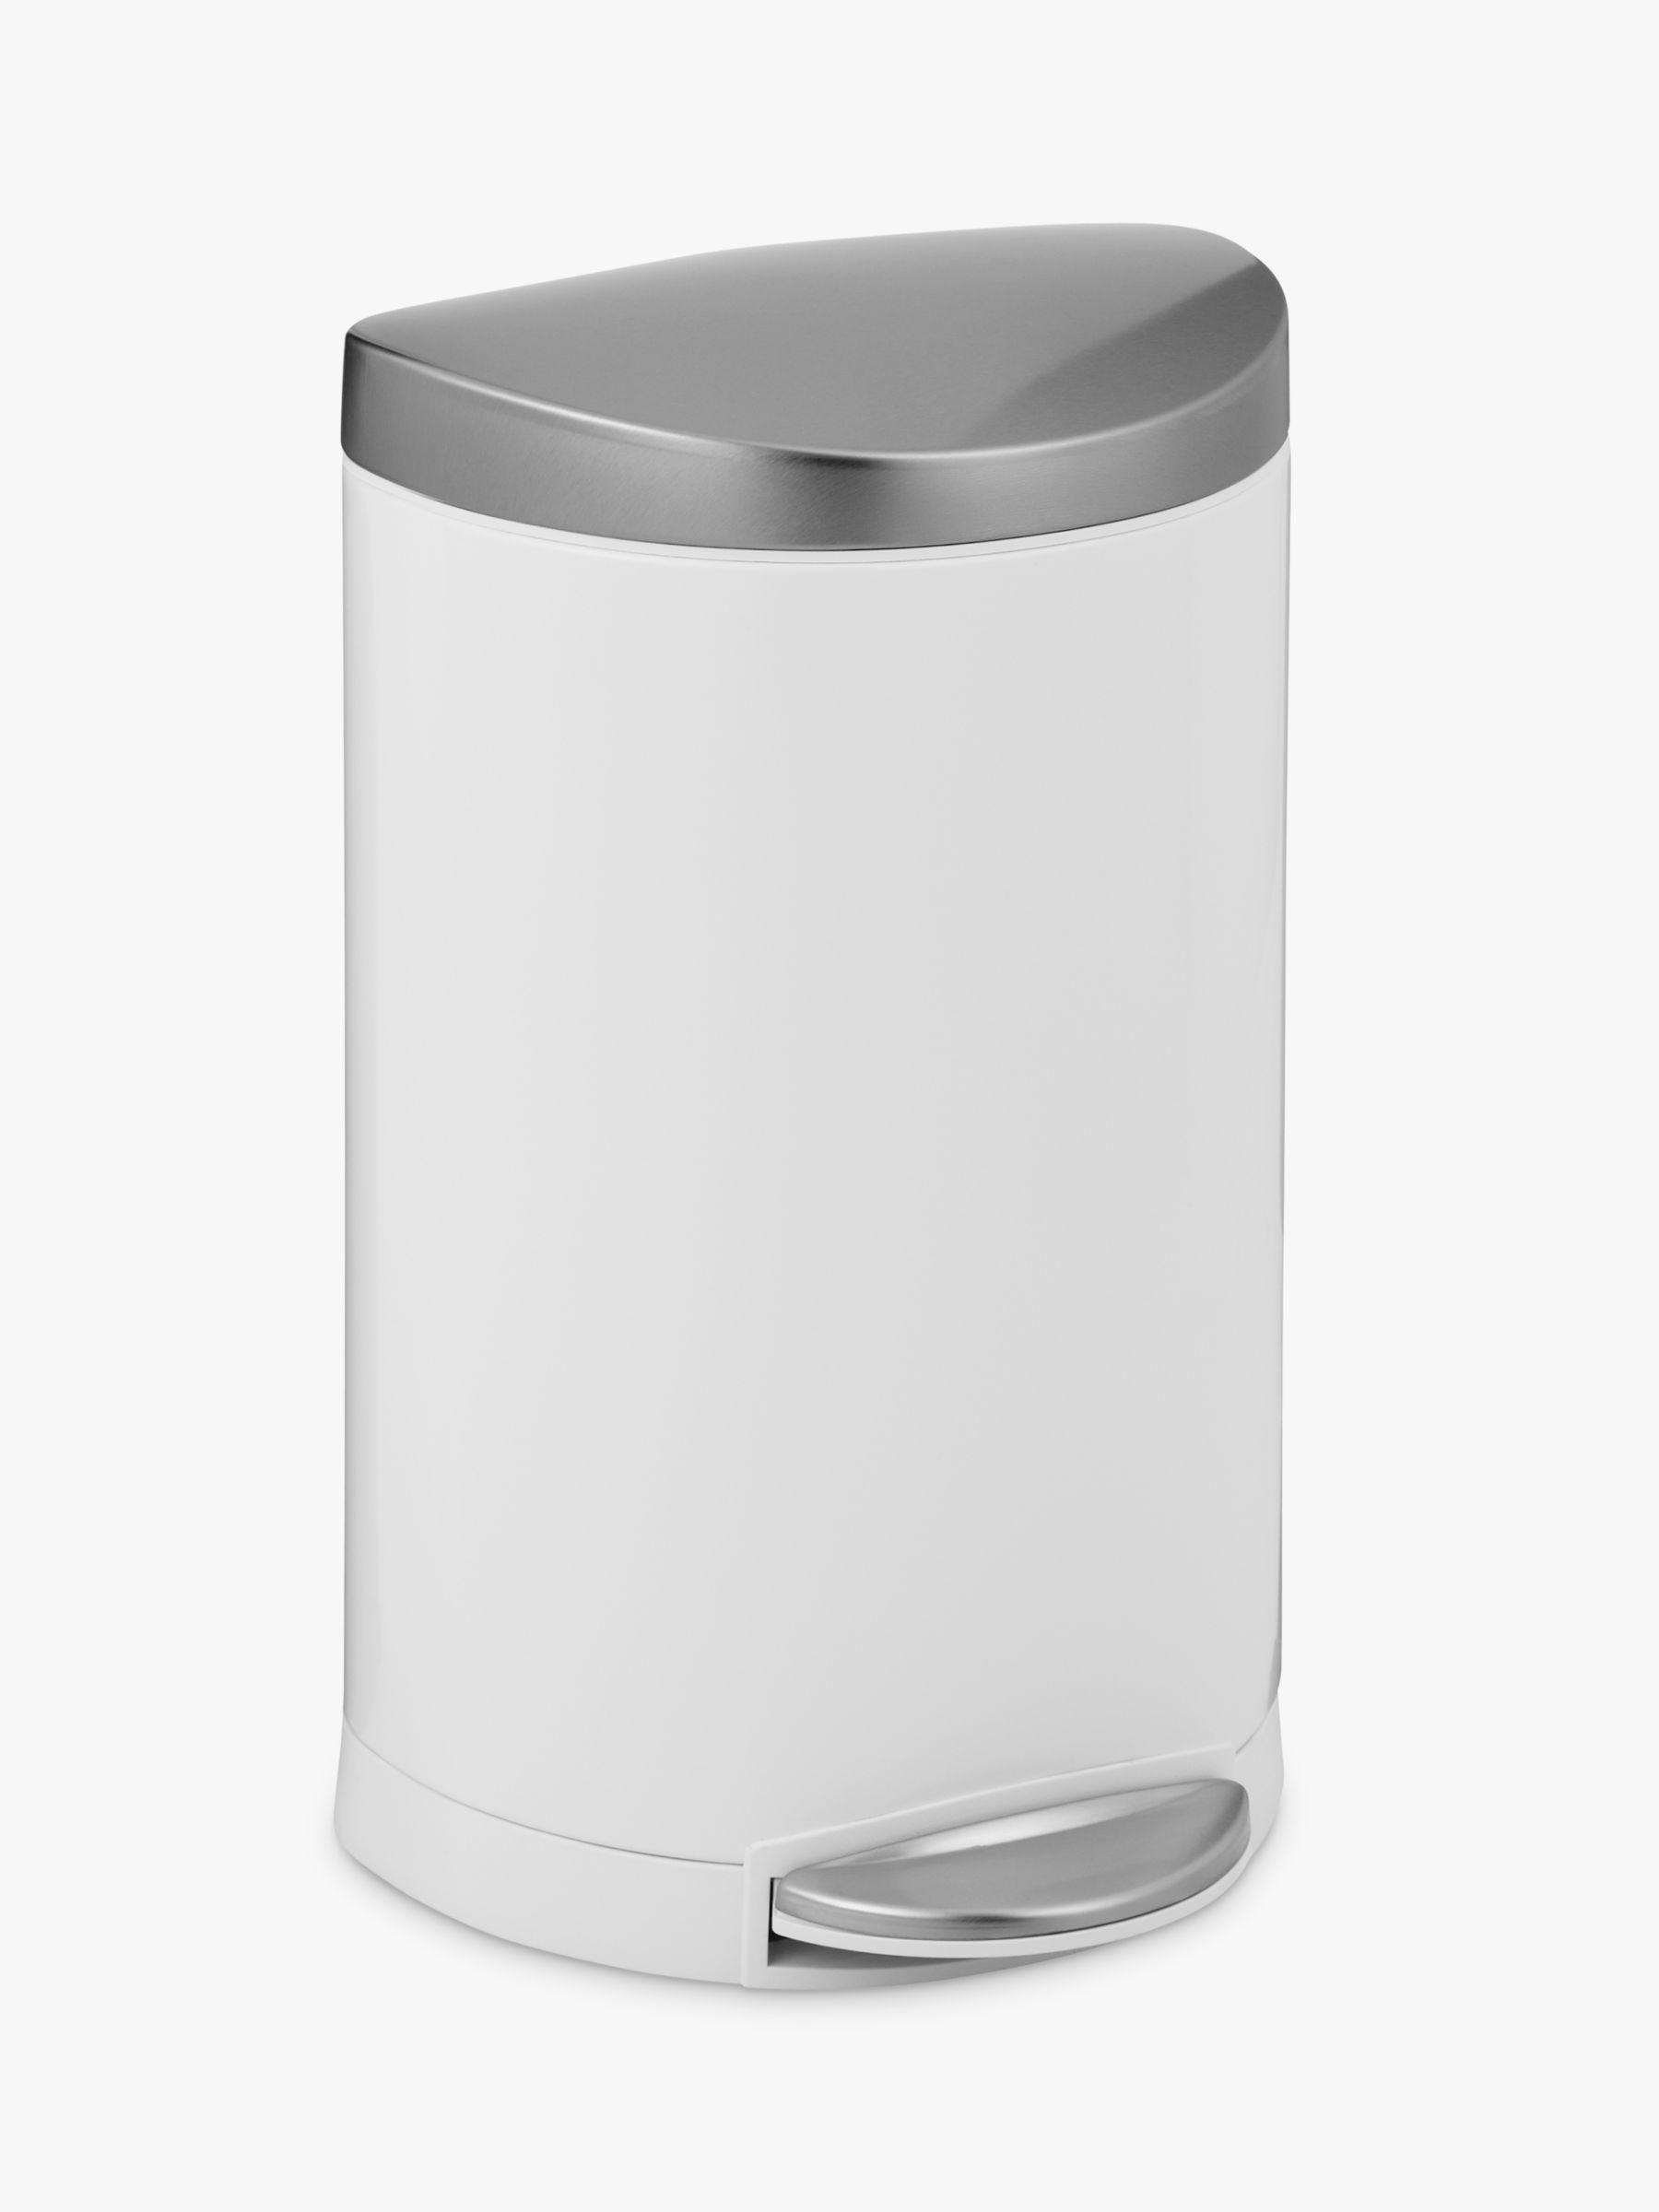 Simplehuman simplehuman Deluxe Semi-Round Pedal Bin, White, 10L